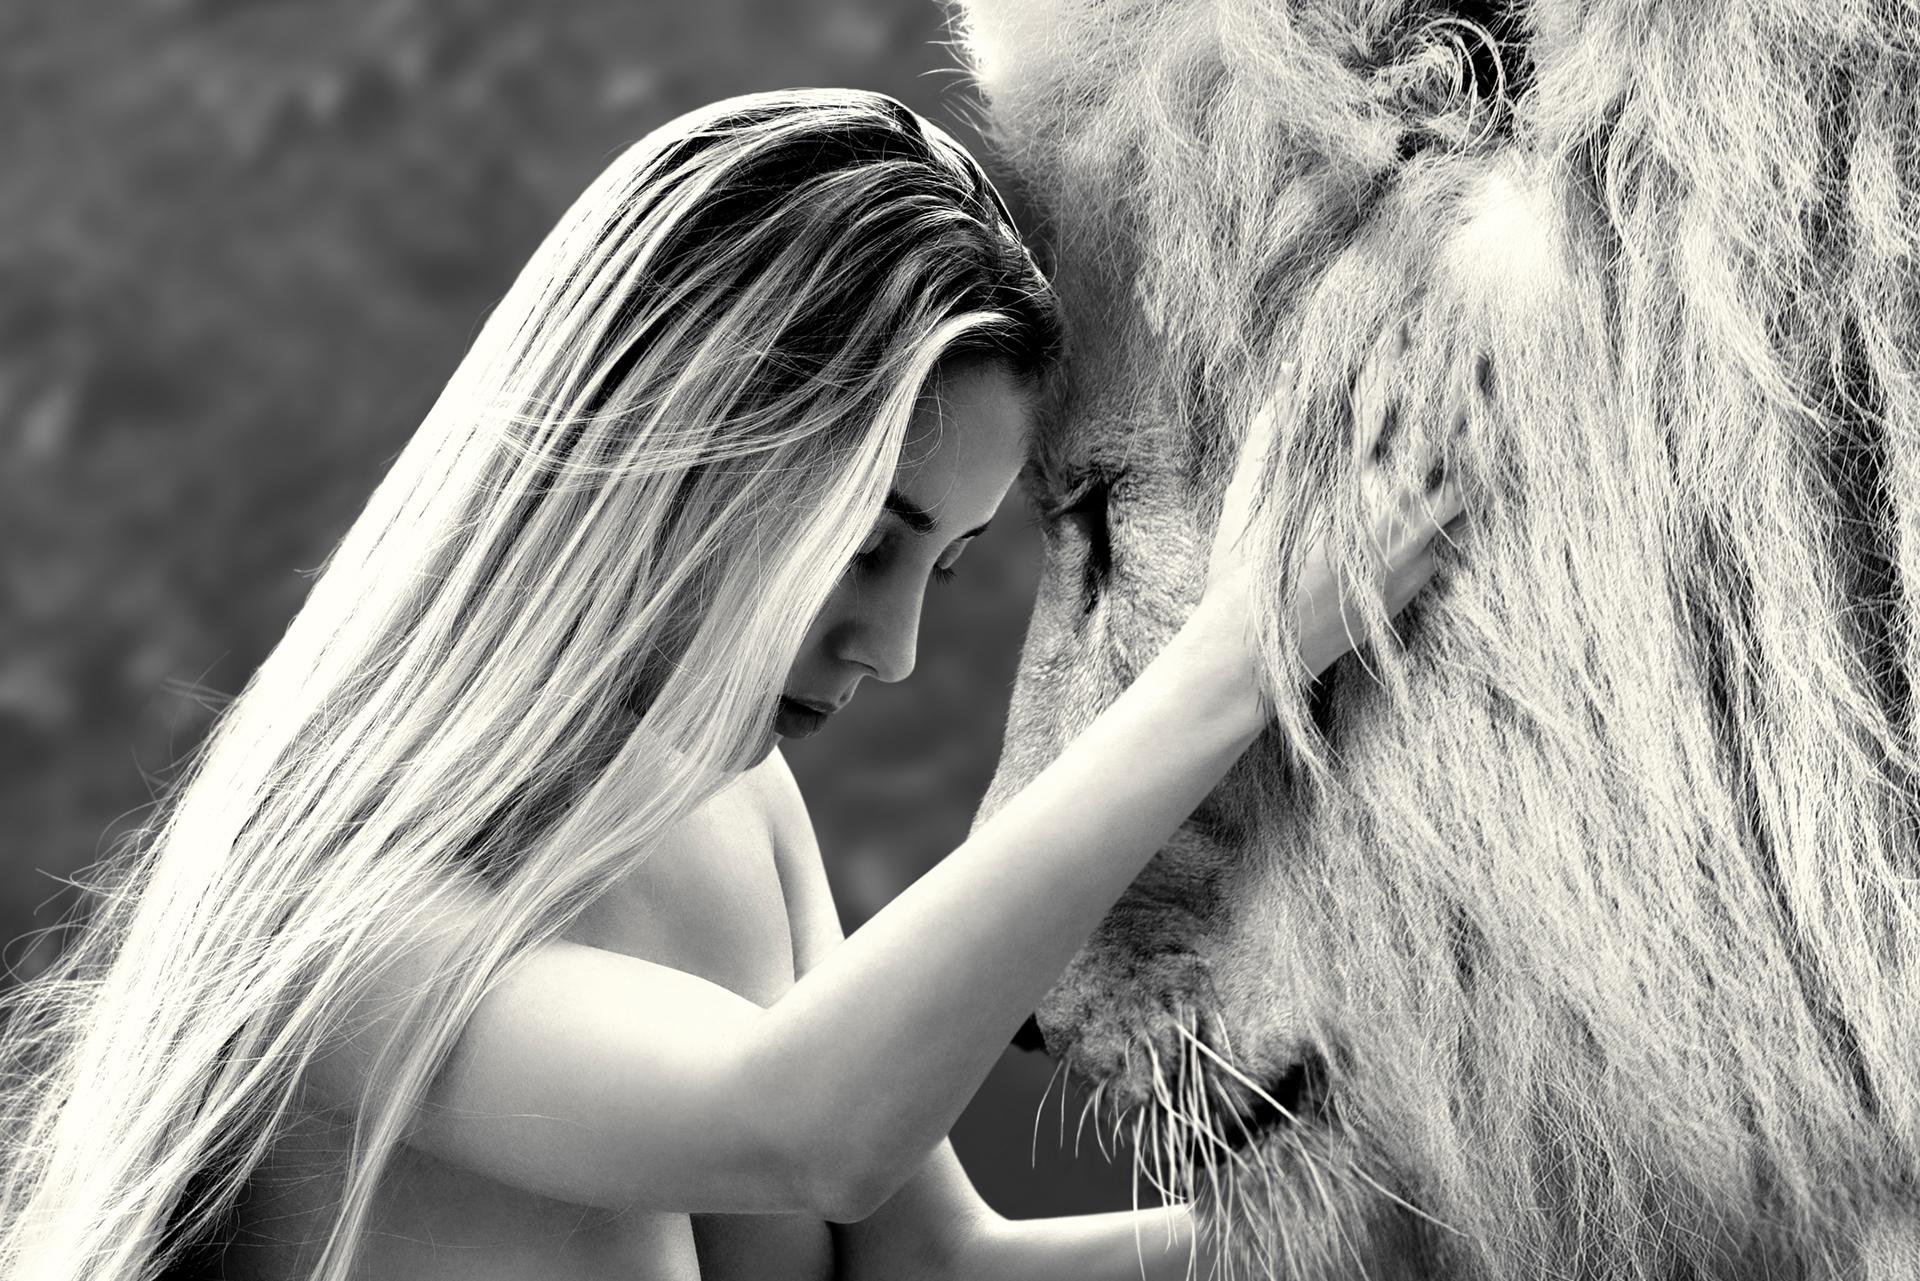 Closeup of a woman hugging a lion